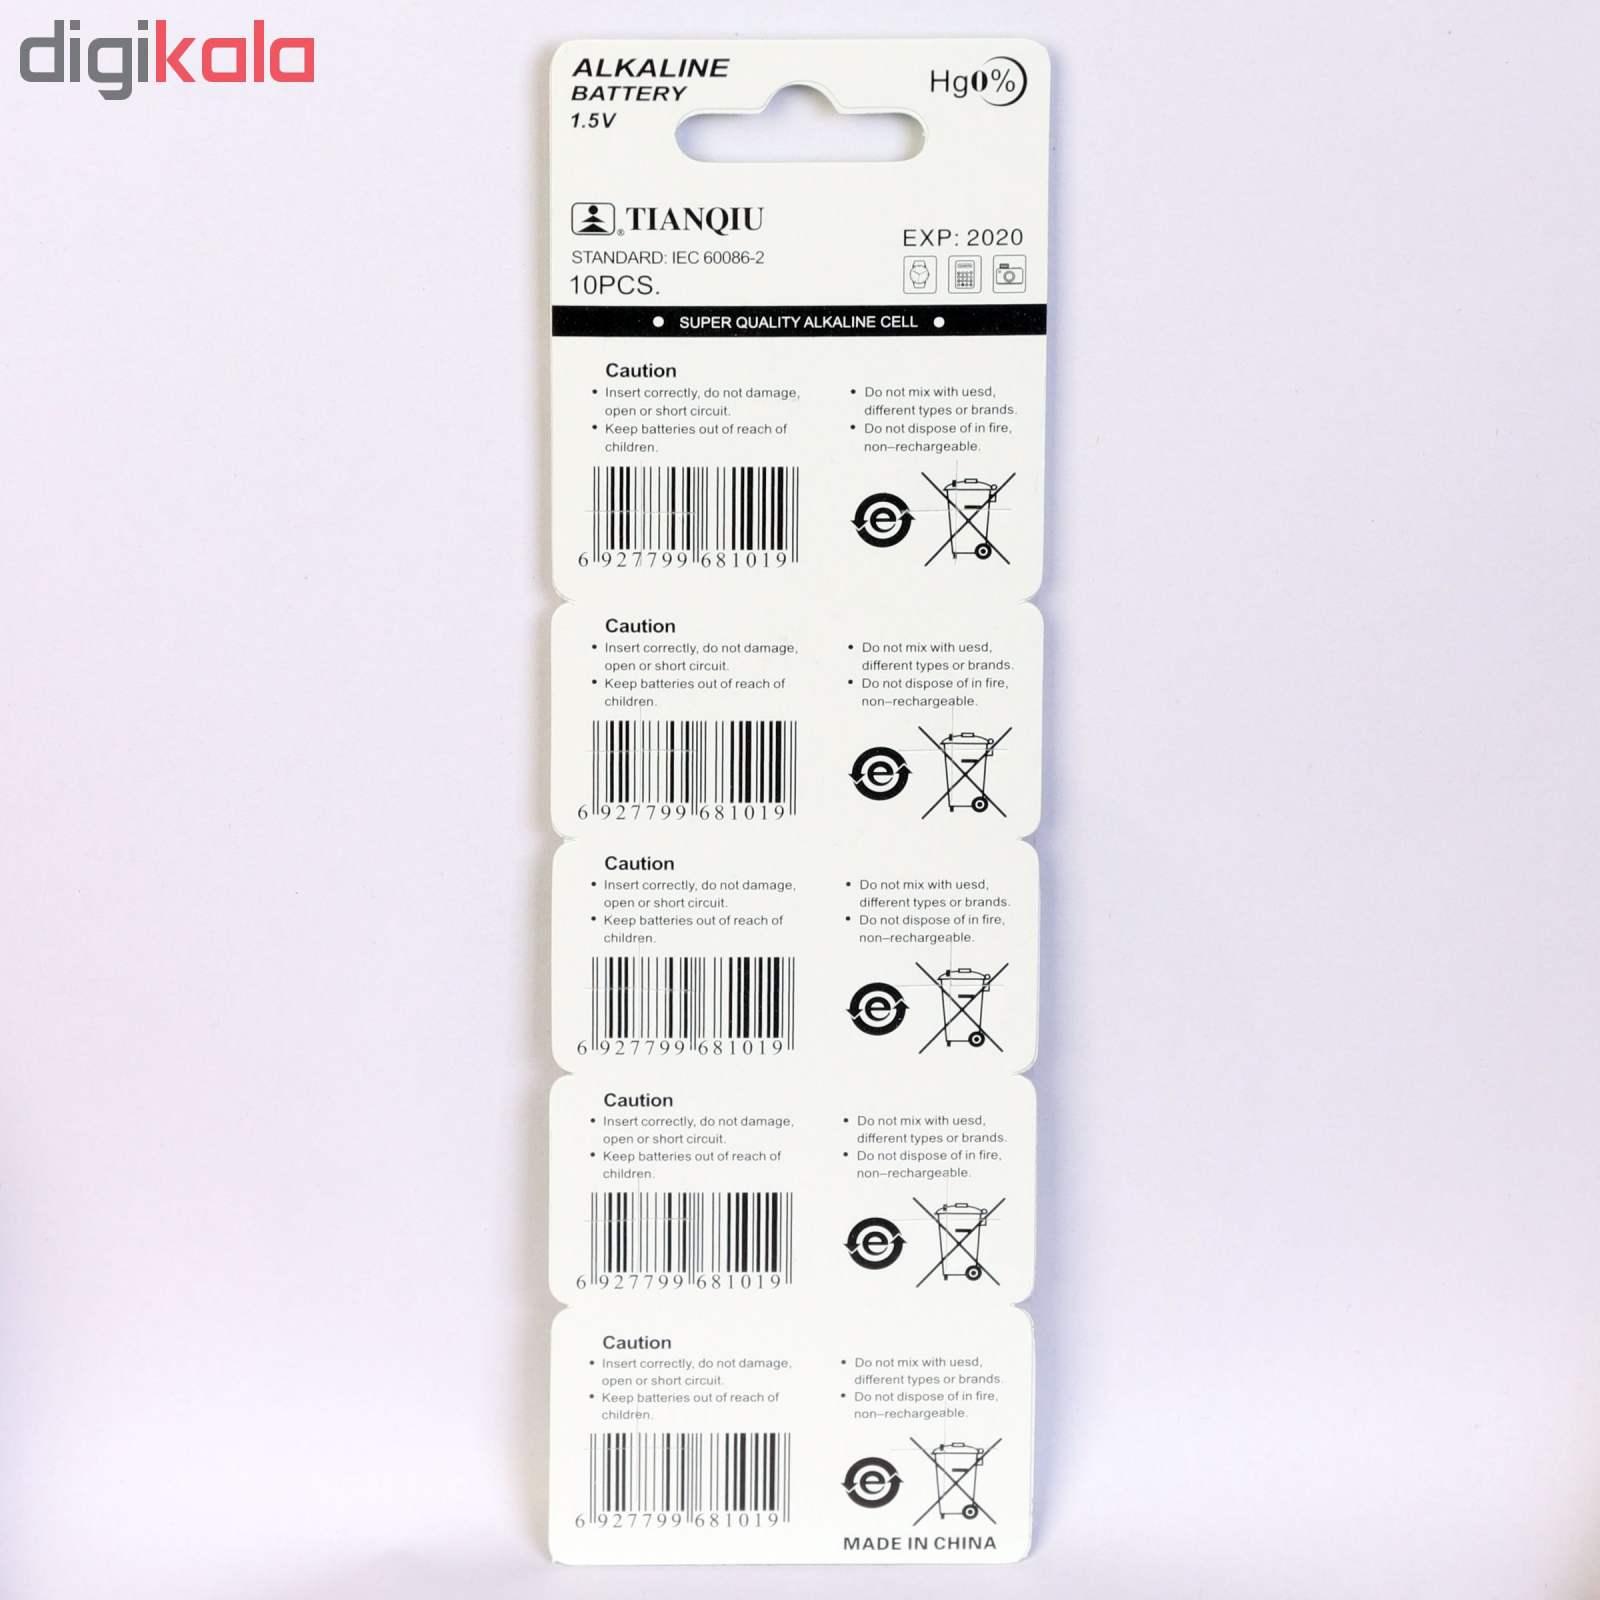 باتری ساعتی تیانکیو مدل AG1 بسته 10 عددی thumb 2